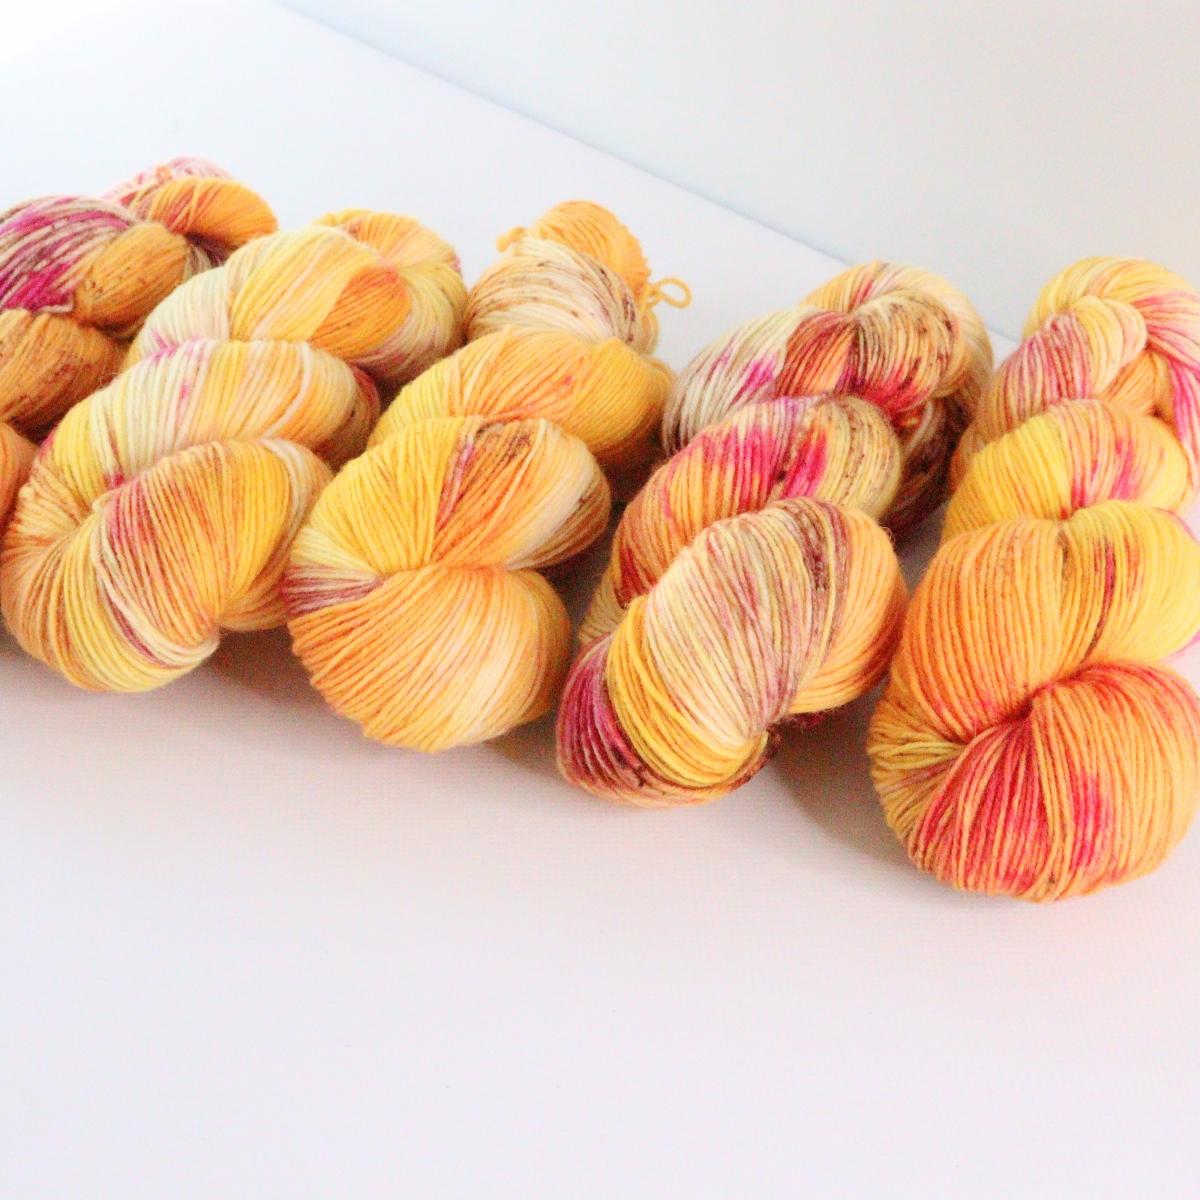 woodico.pro hand dyed yarn 071 2 1200x1200 - Hand dyed yarn / 071